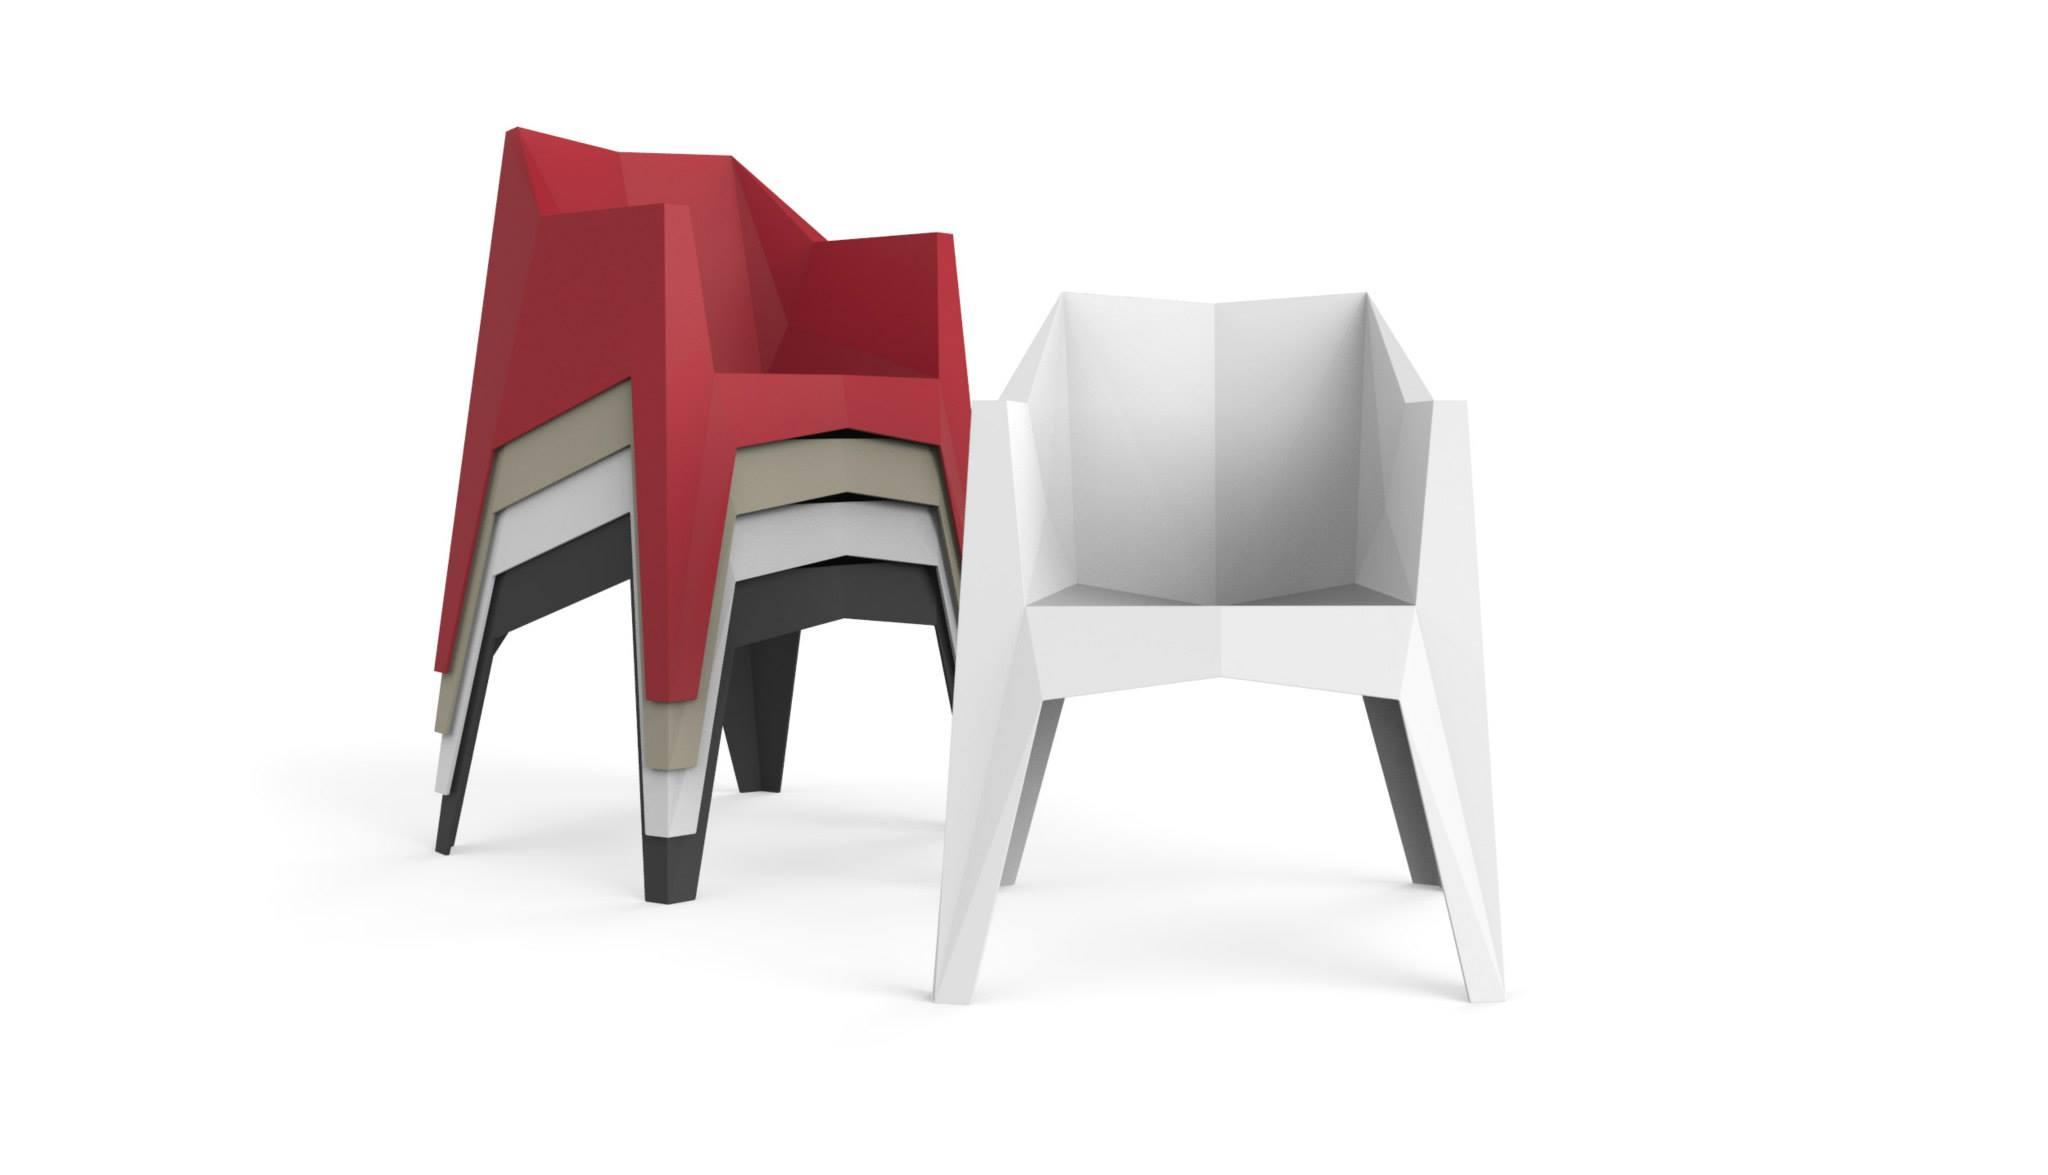 Voxel Chair by Karim Rashid for Vondom